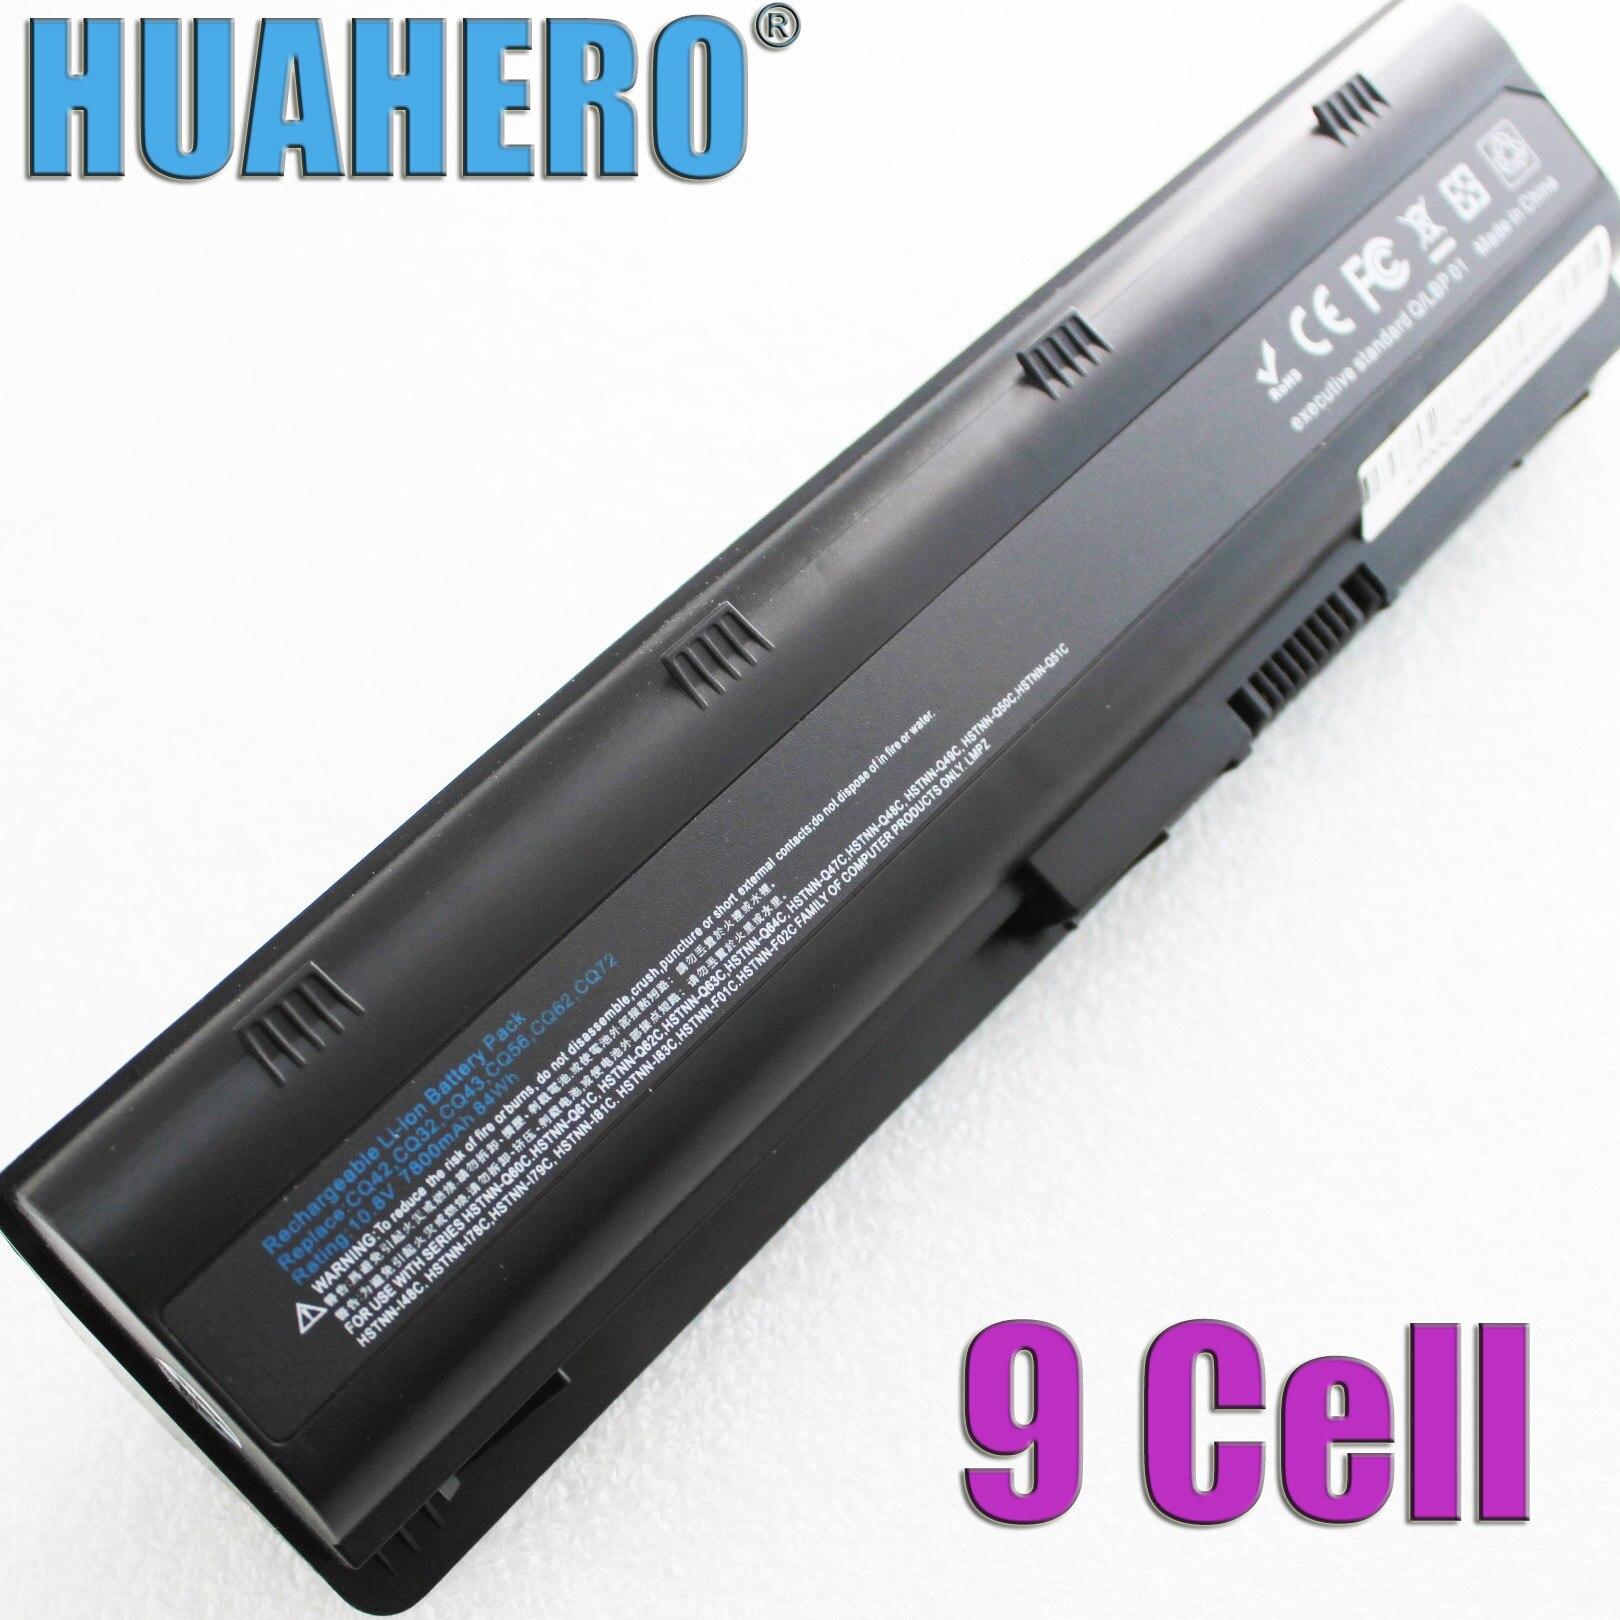 Аккумулятор HUAHERO MU06 MU09 для HP Pavilion g4 g6 g7 CQ32 CQ42 CQ62 CQ72 DM4 G32 G42 G62 G56 G72 HSTNN CBOX Q60C CB0W 586006-321